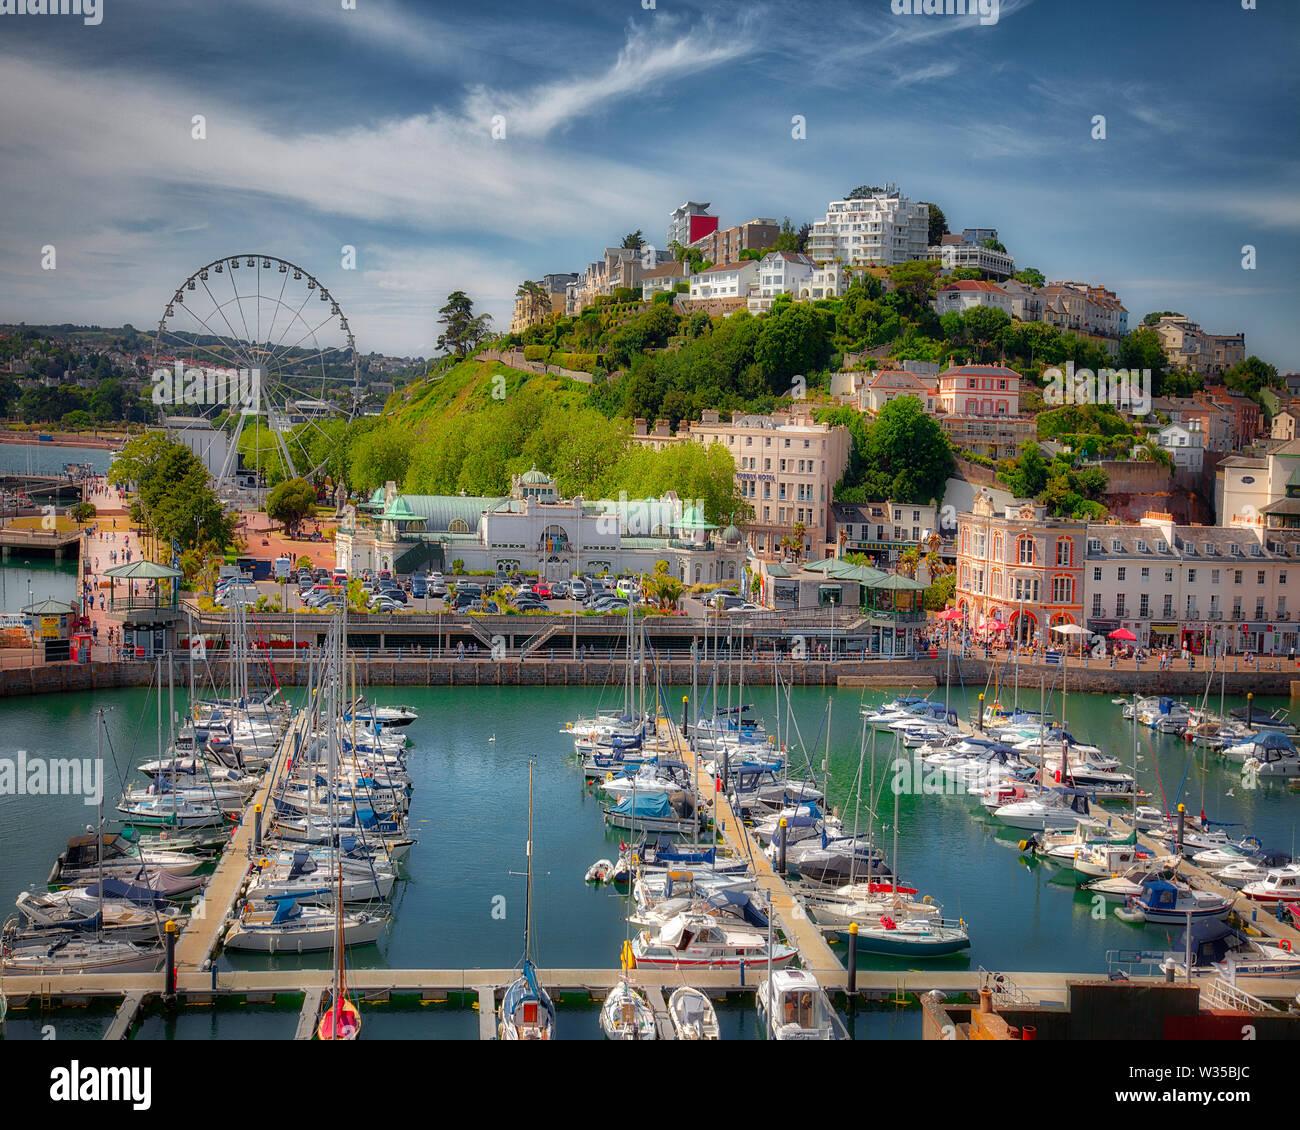 GB - DEVON: Torquay Harbour View  (HDR-Image) - Stock Image